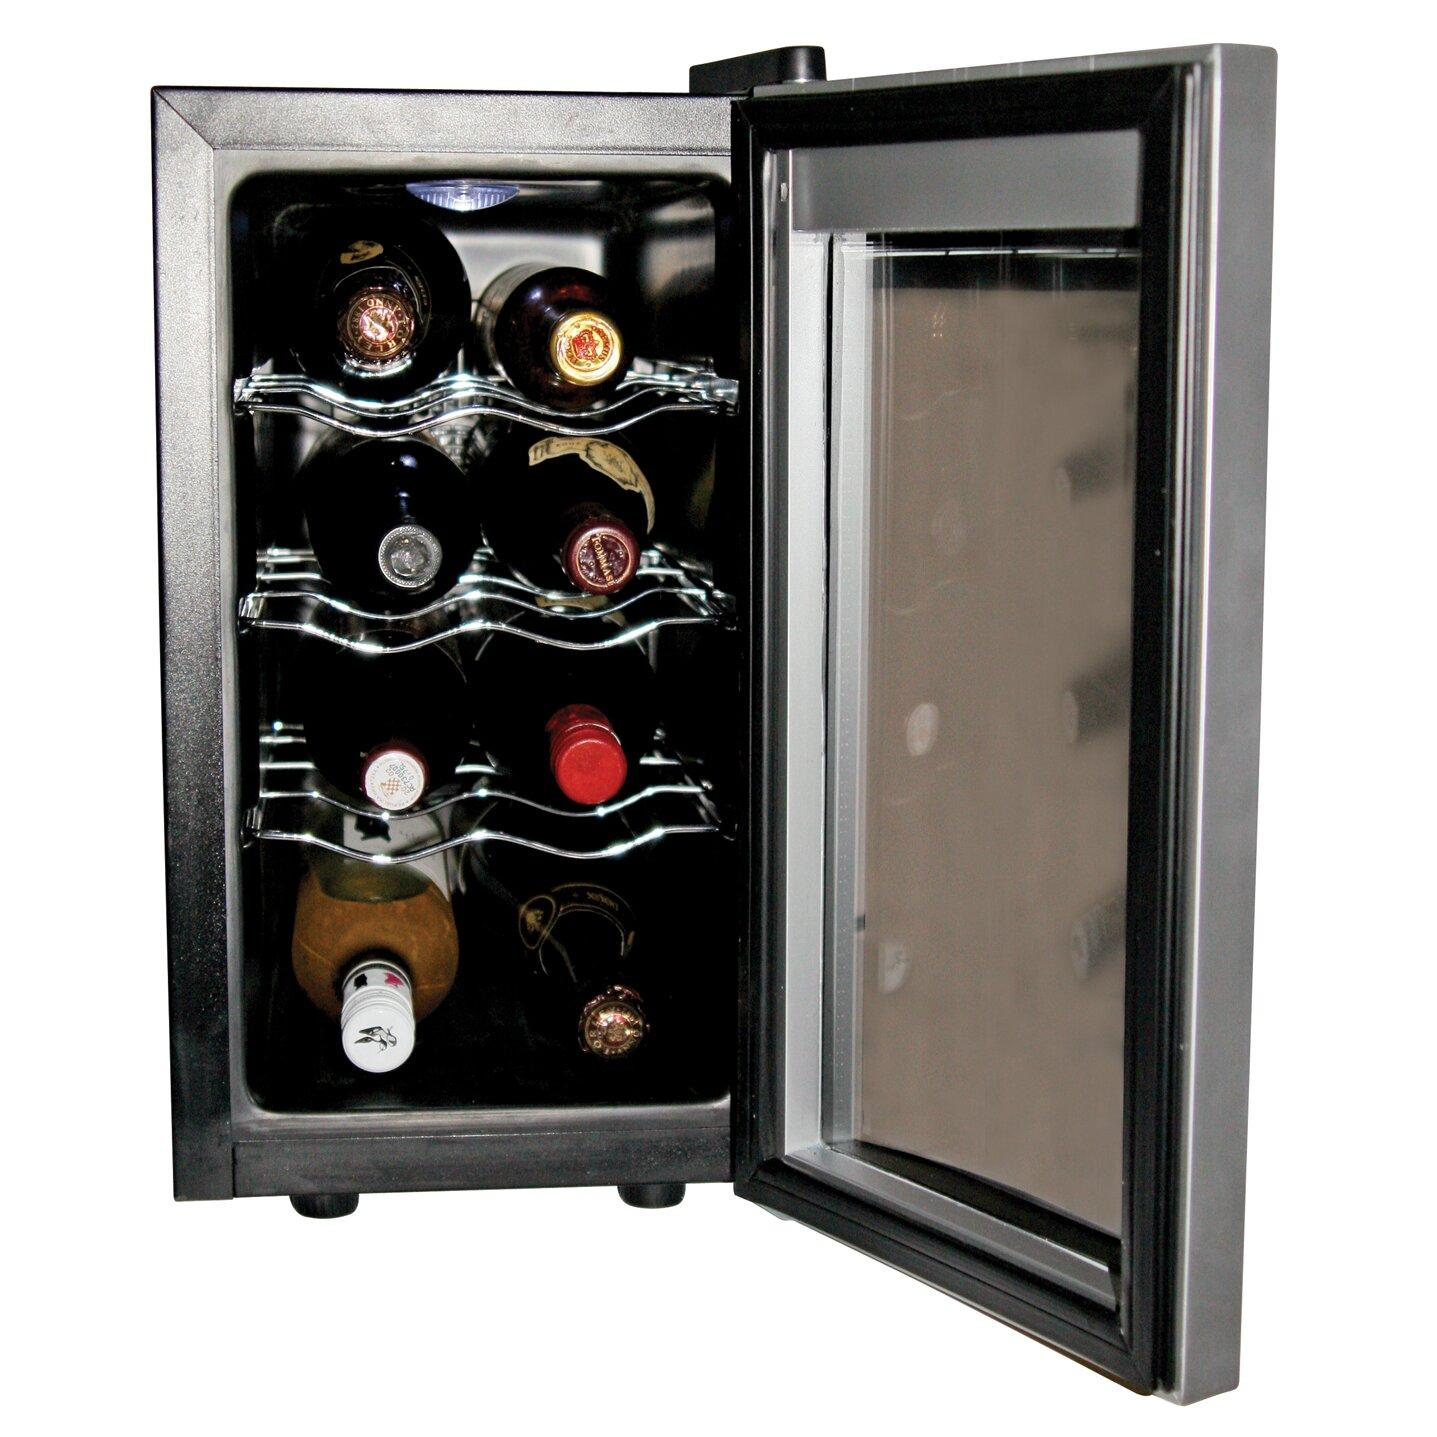 koolatron koolatron 8 bottle single zone built in wine refrigerator reviews wayfair. Black Bedroom Furniture Sets. Home Design Ideas